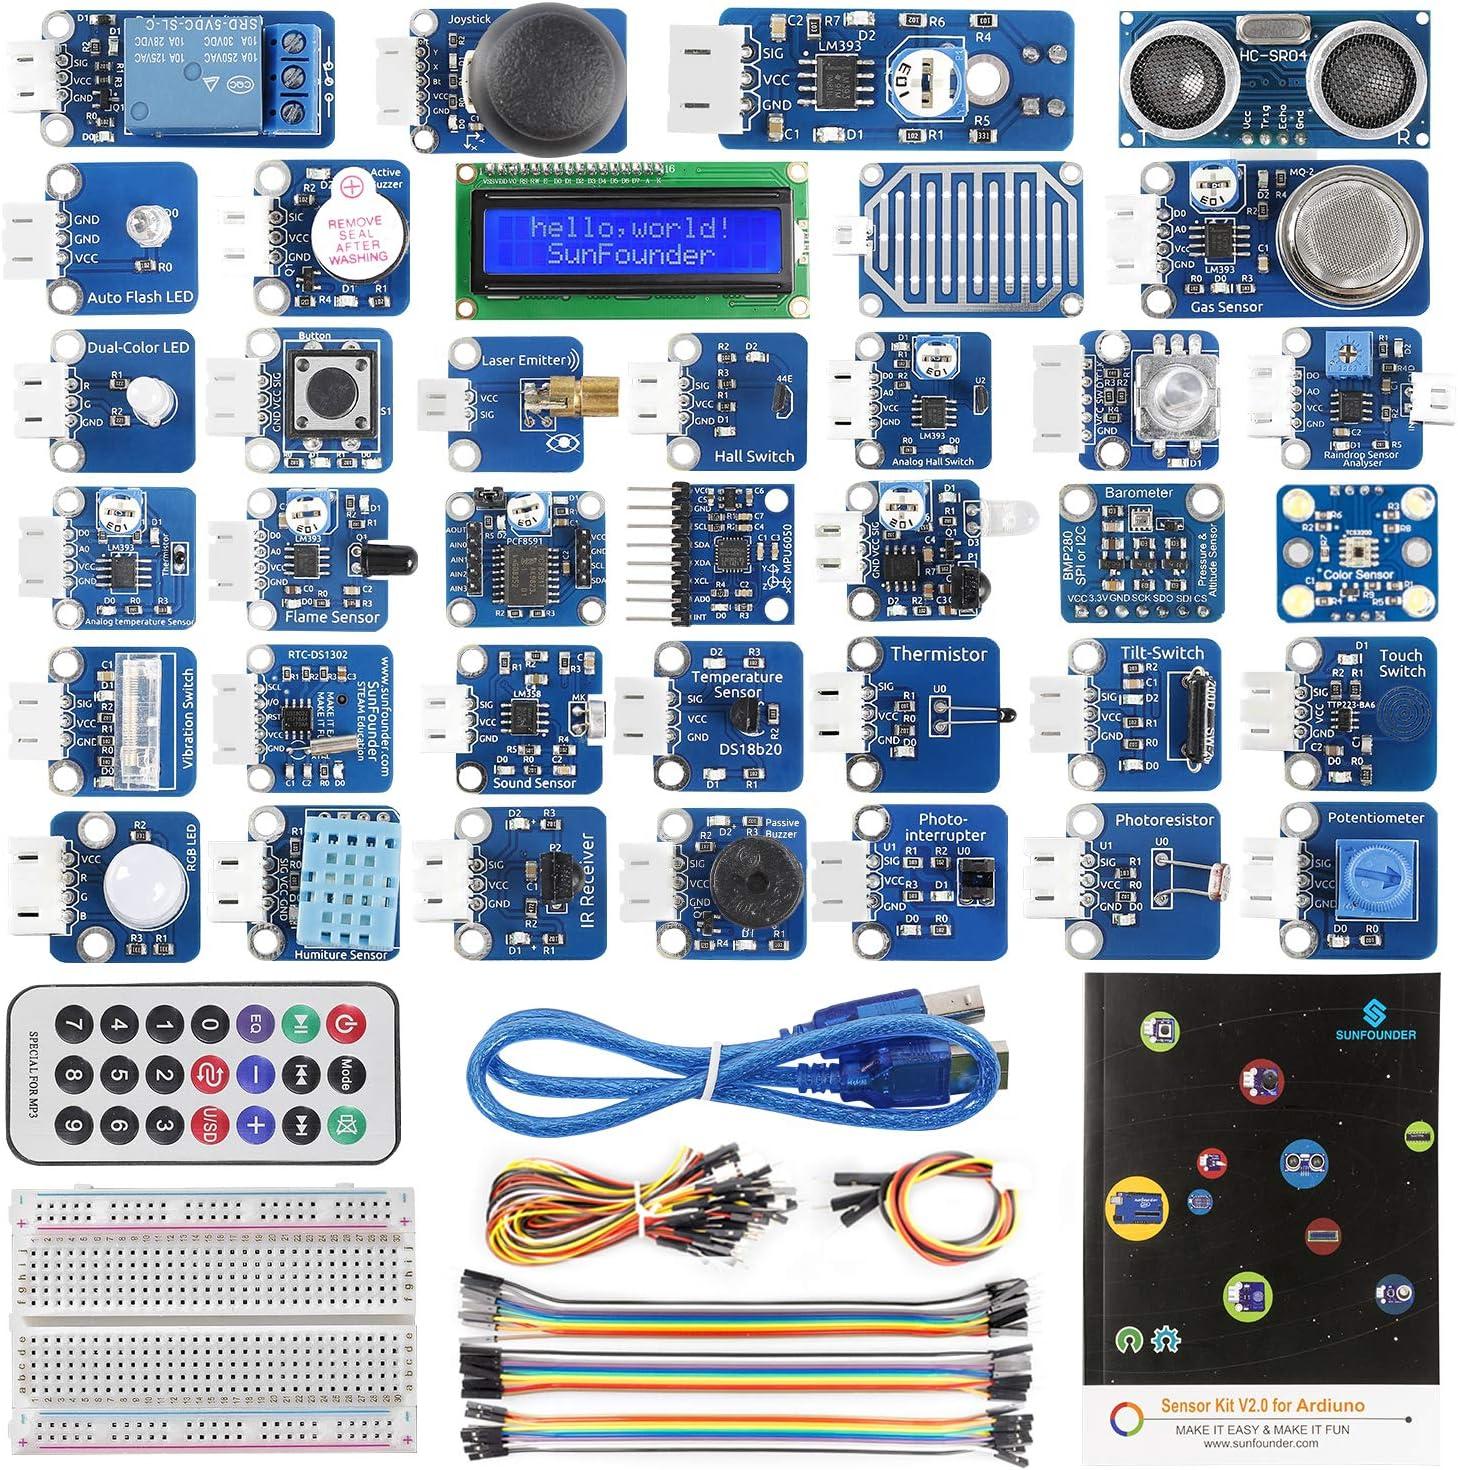 SunFounder Complete Sensor Kit for Arduino R3 Mega2560 Mega328 Nano, 36 Tutorials Included